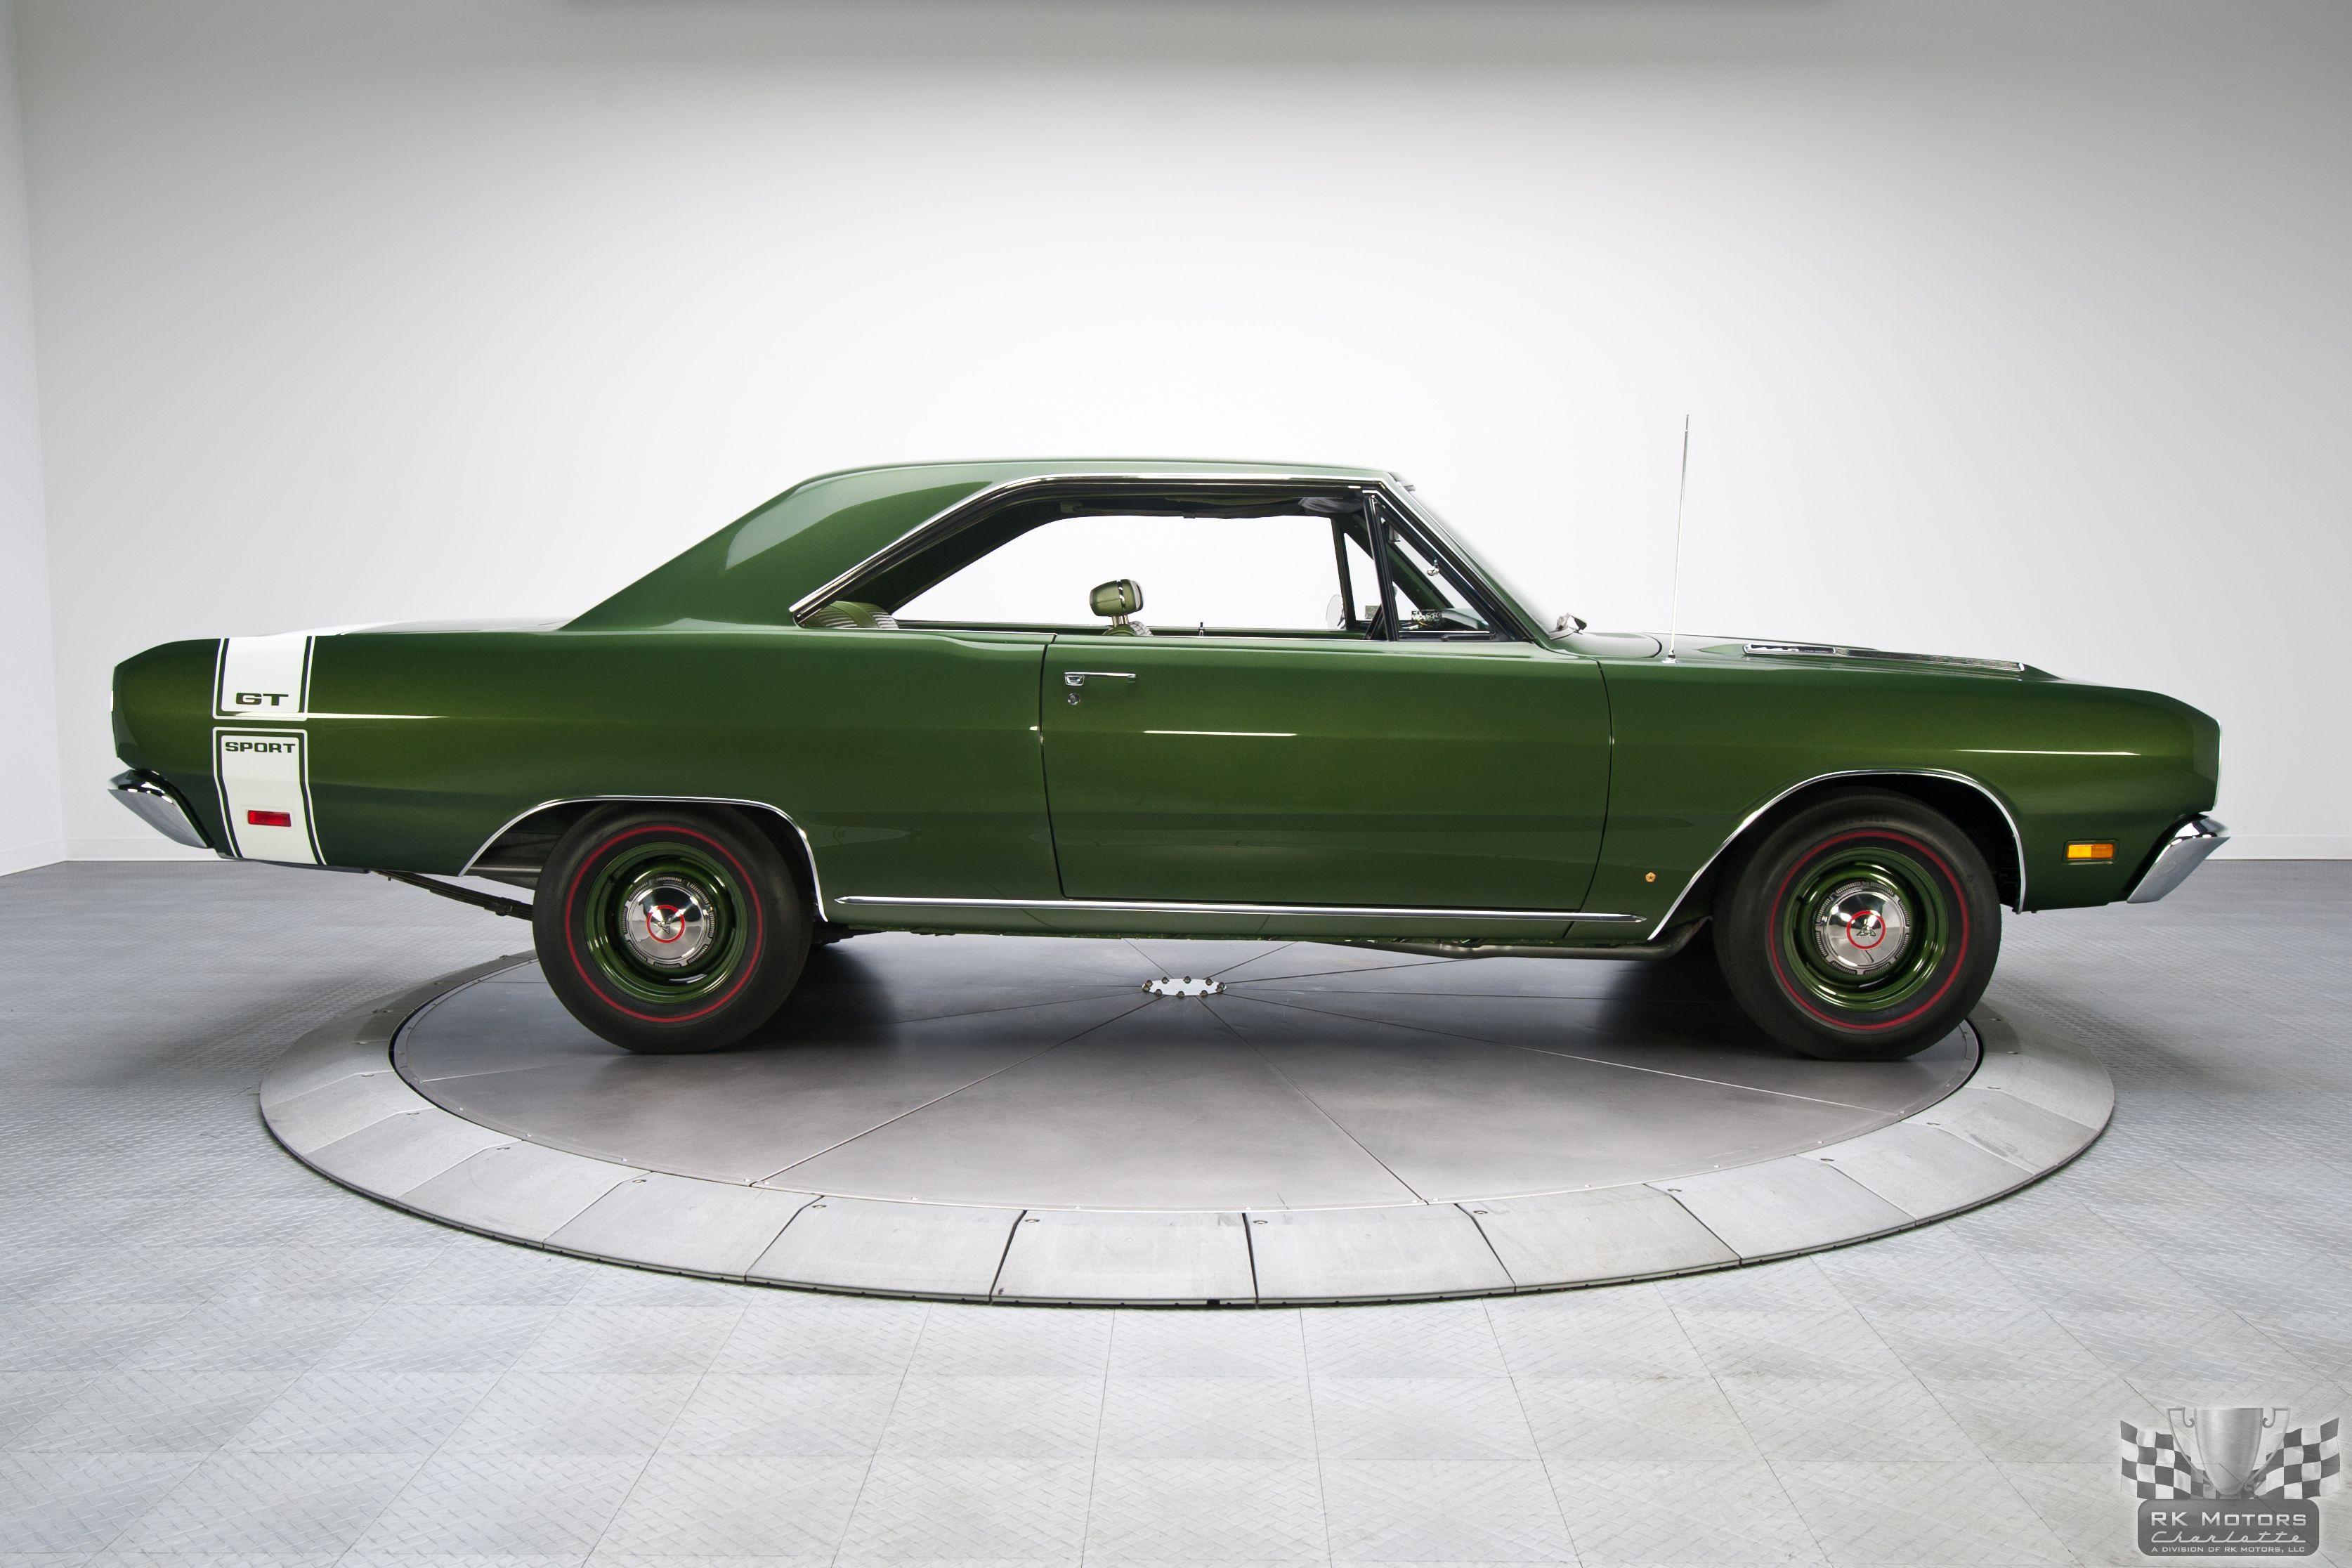 1969 Dodge Dart Gts Dodge Muscle Cars Mopar Cars Mopar